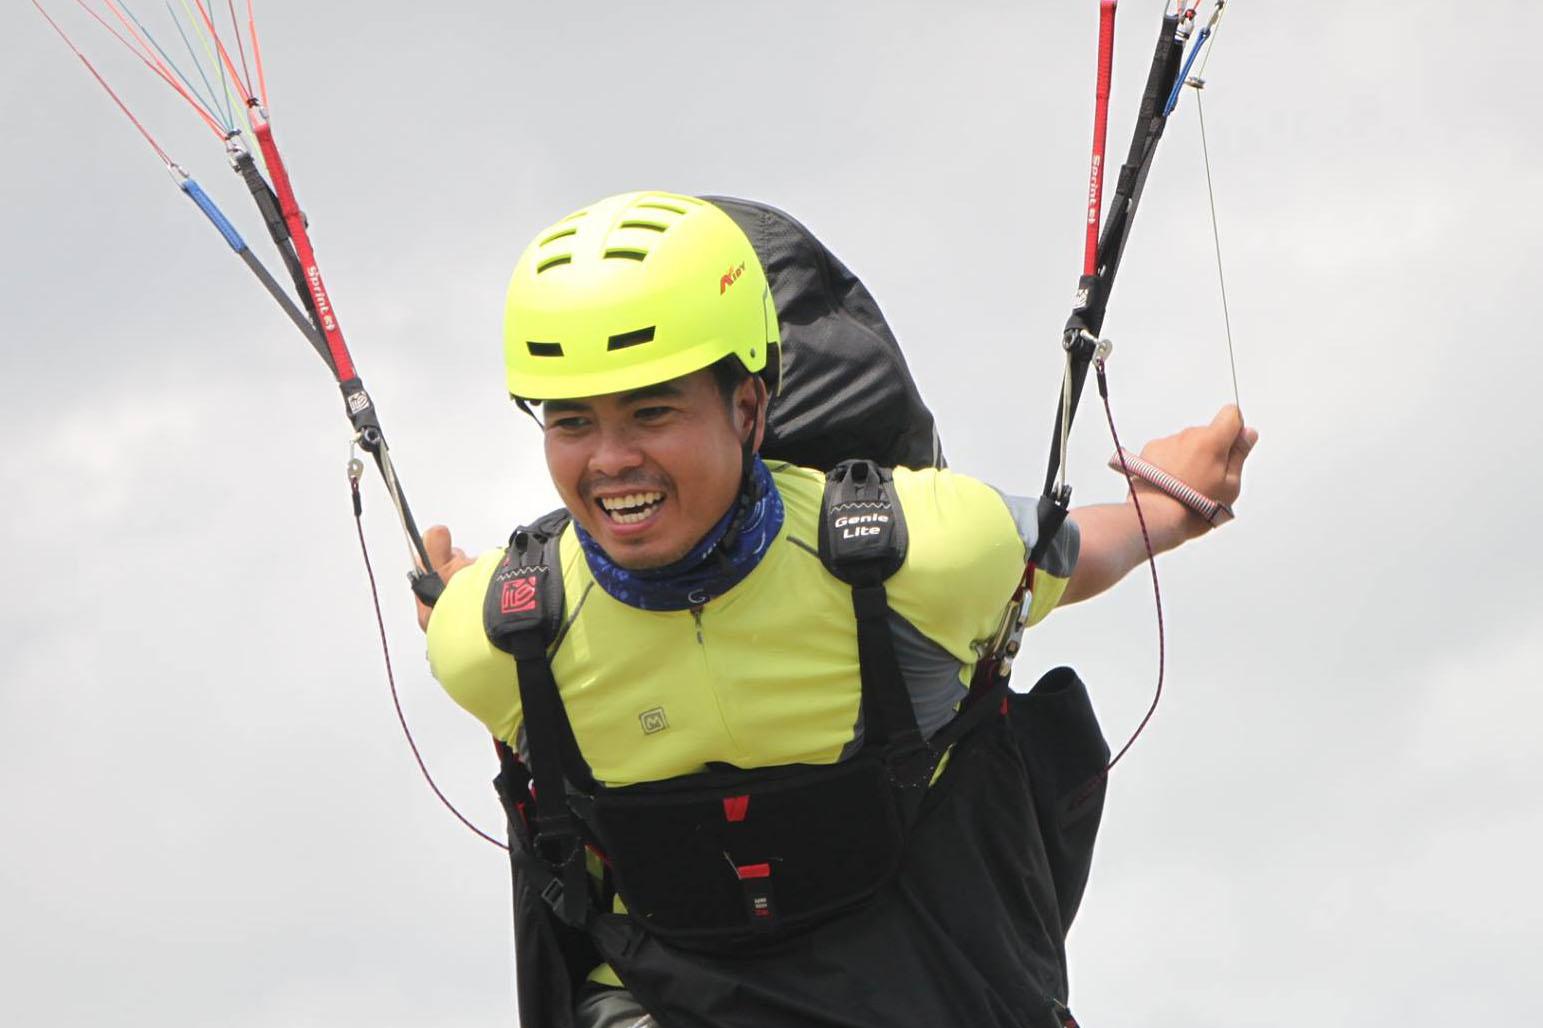 Michale Vincent, Paragliding Instructor and tandem pilot